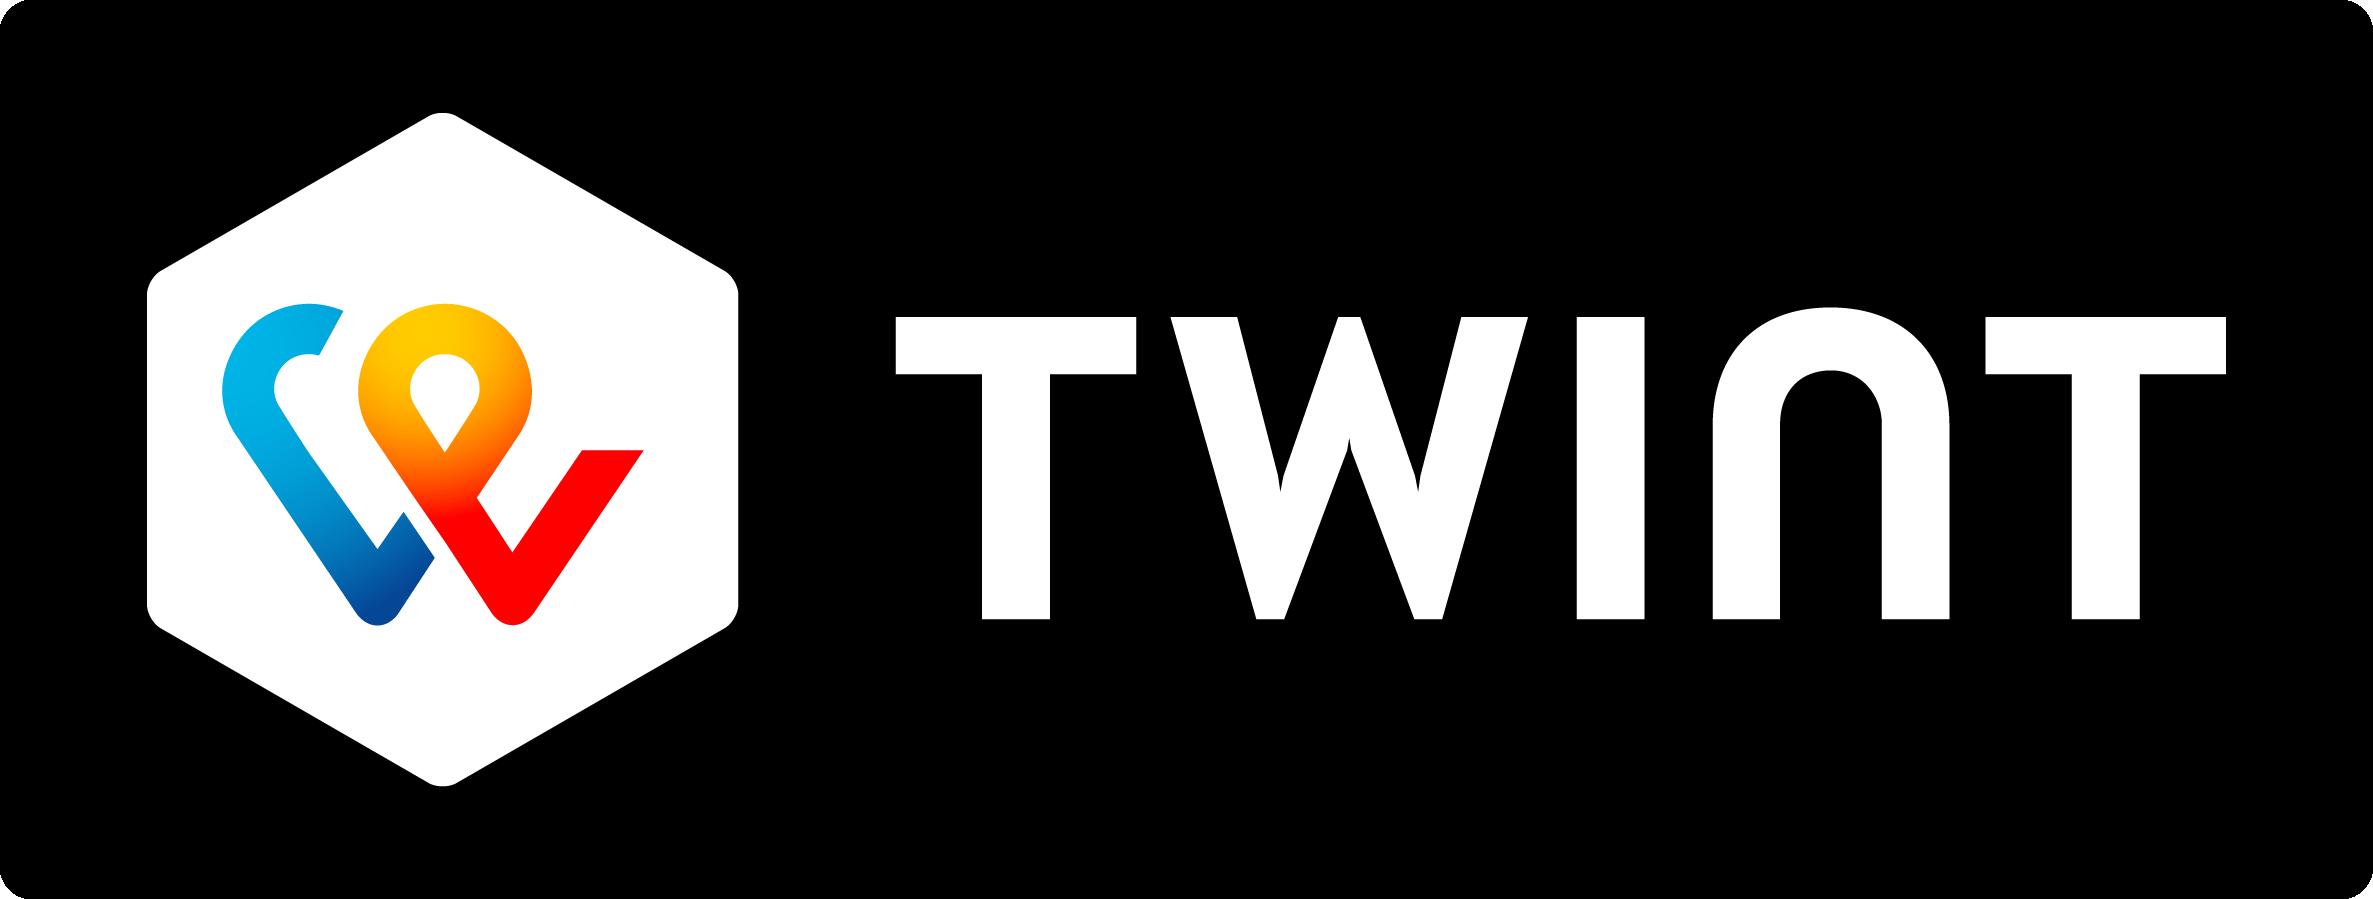 twint_logo_q_pos_bgpng